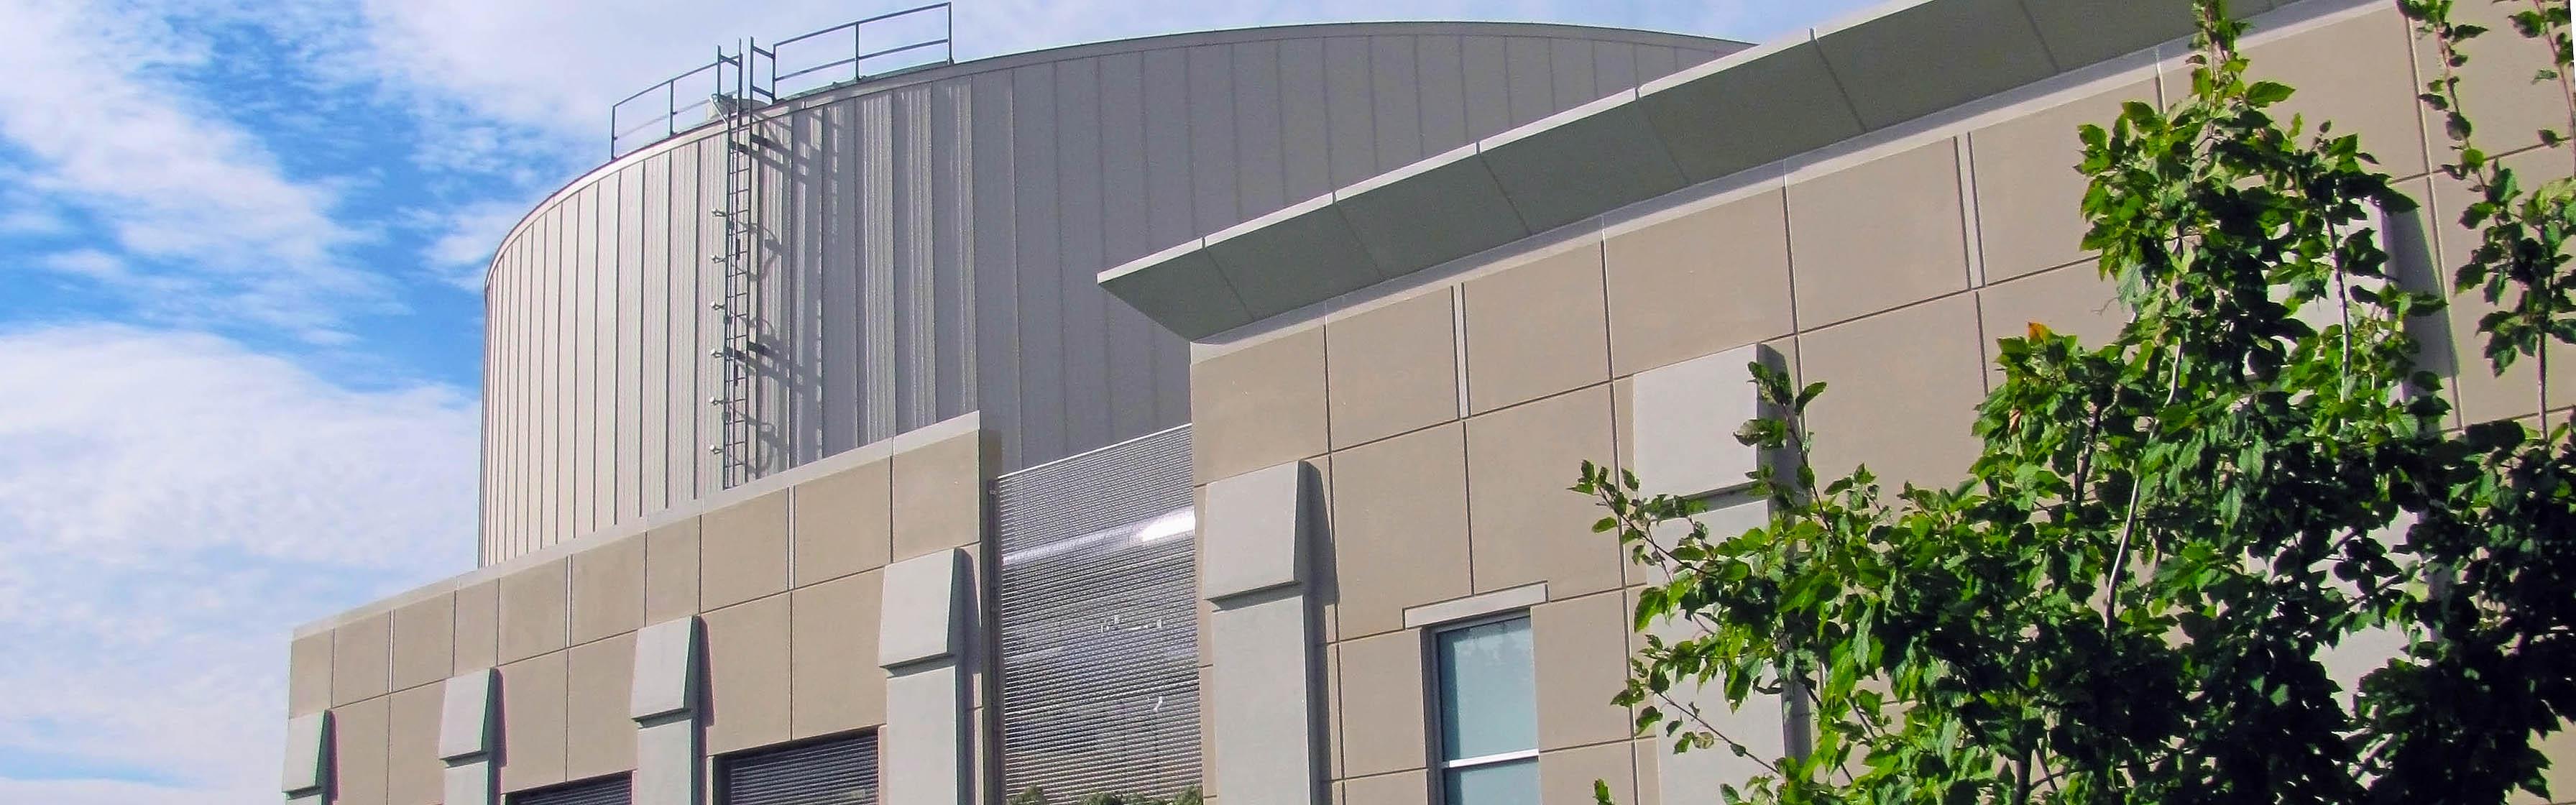 East Campus TES building exterior